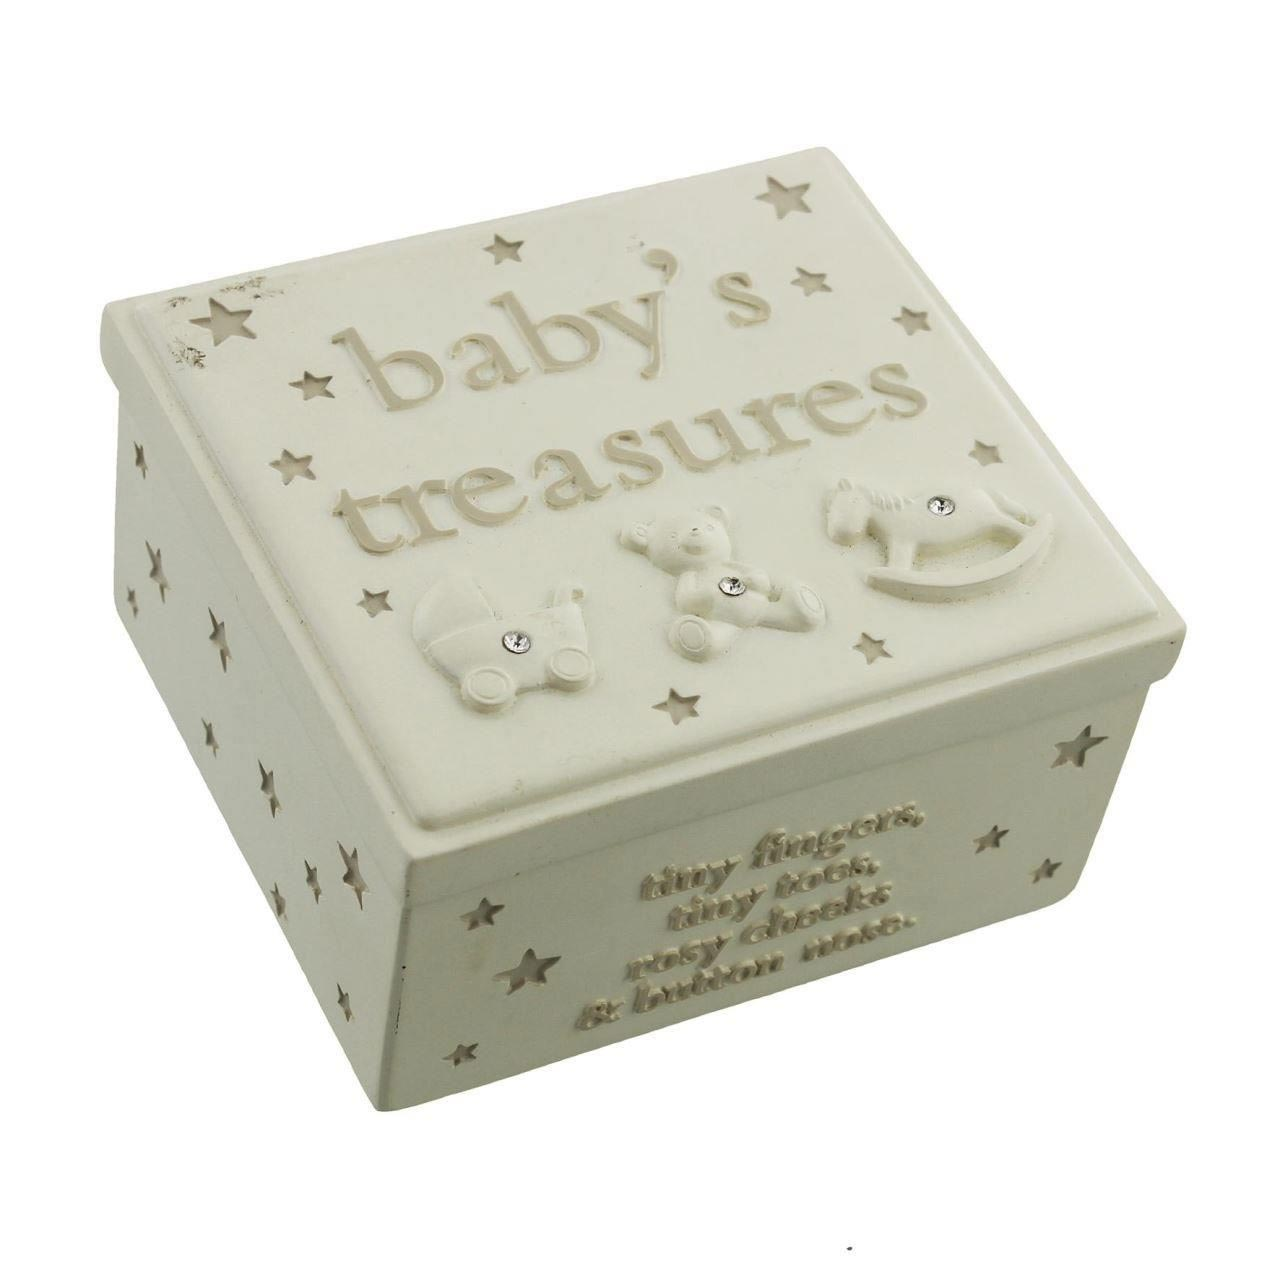 Bambino by Juliana - Cutie amintiri  Baby's Treasures